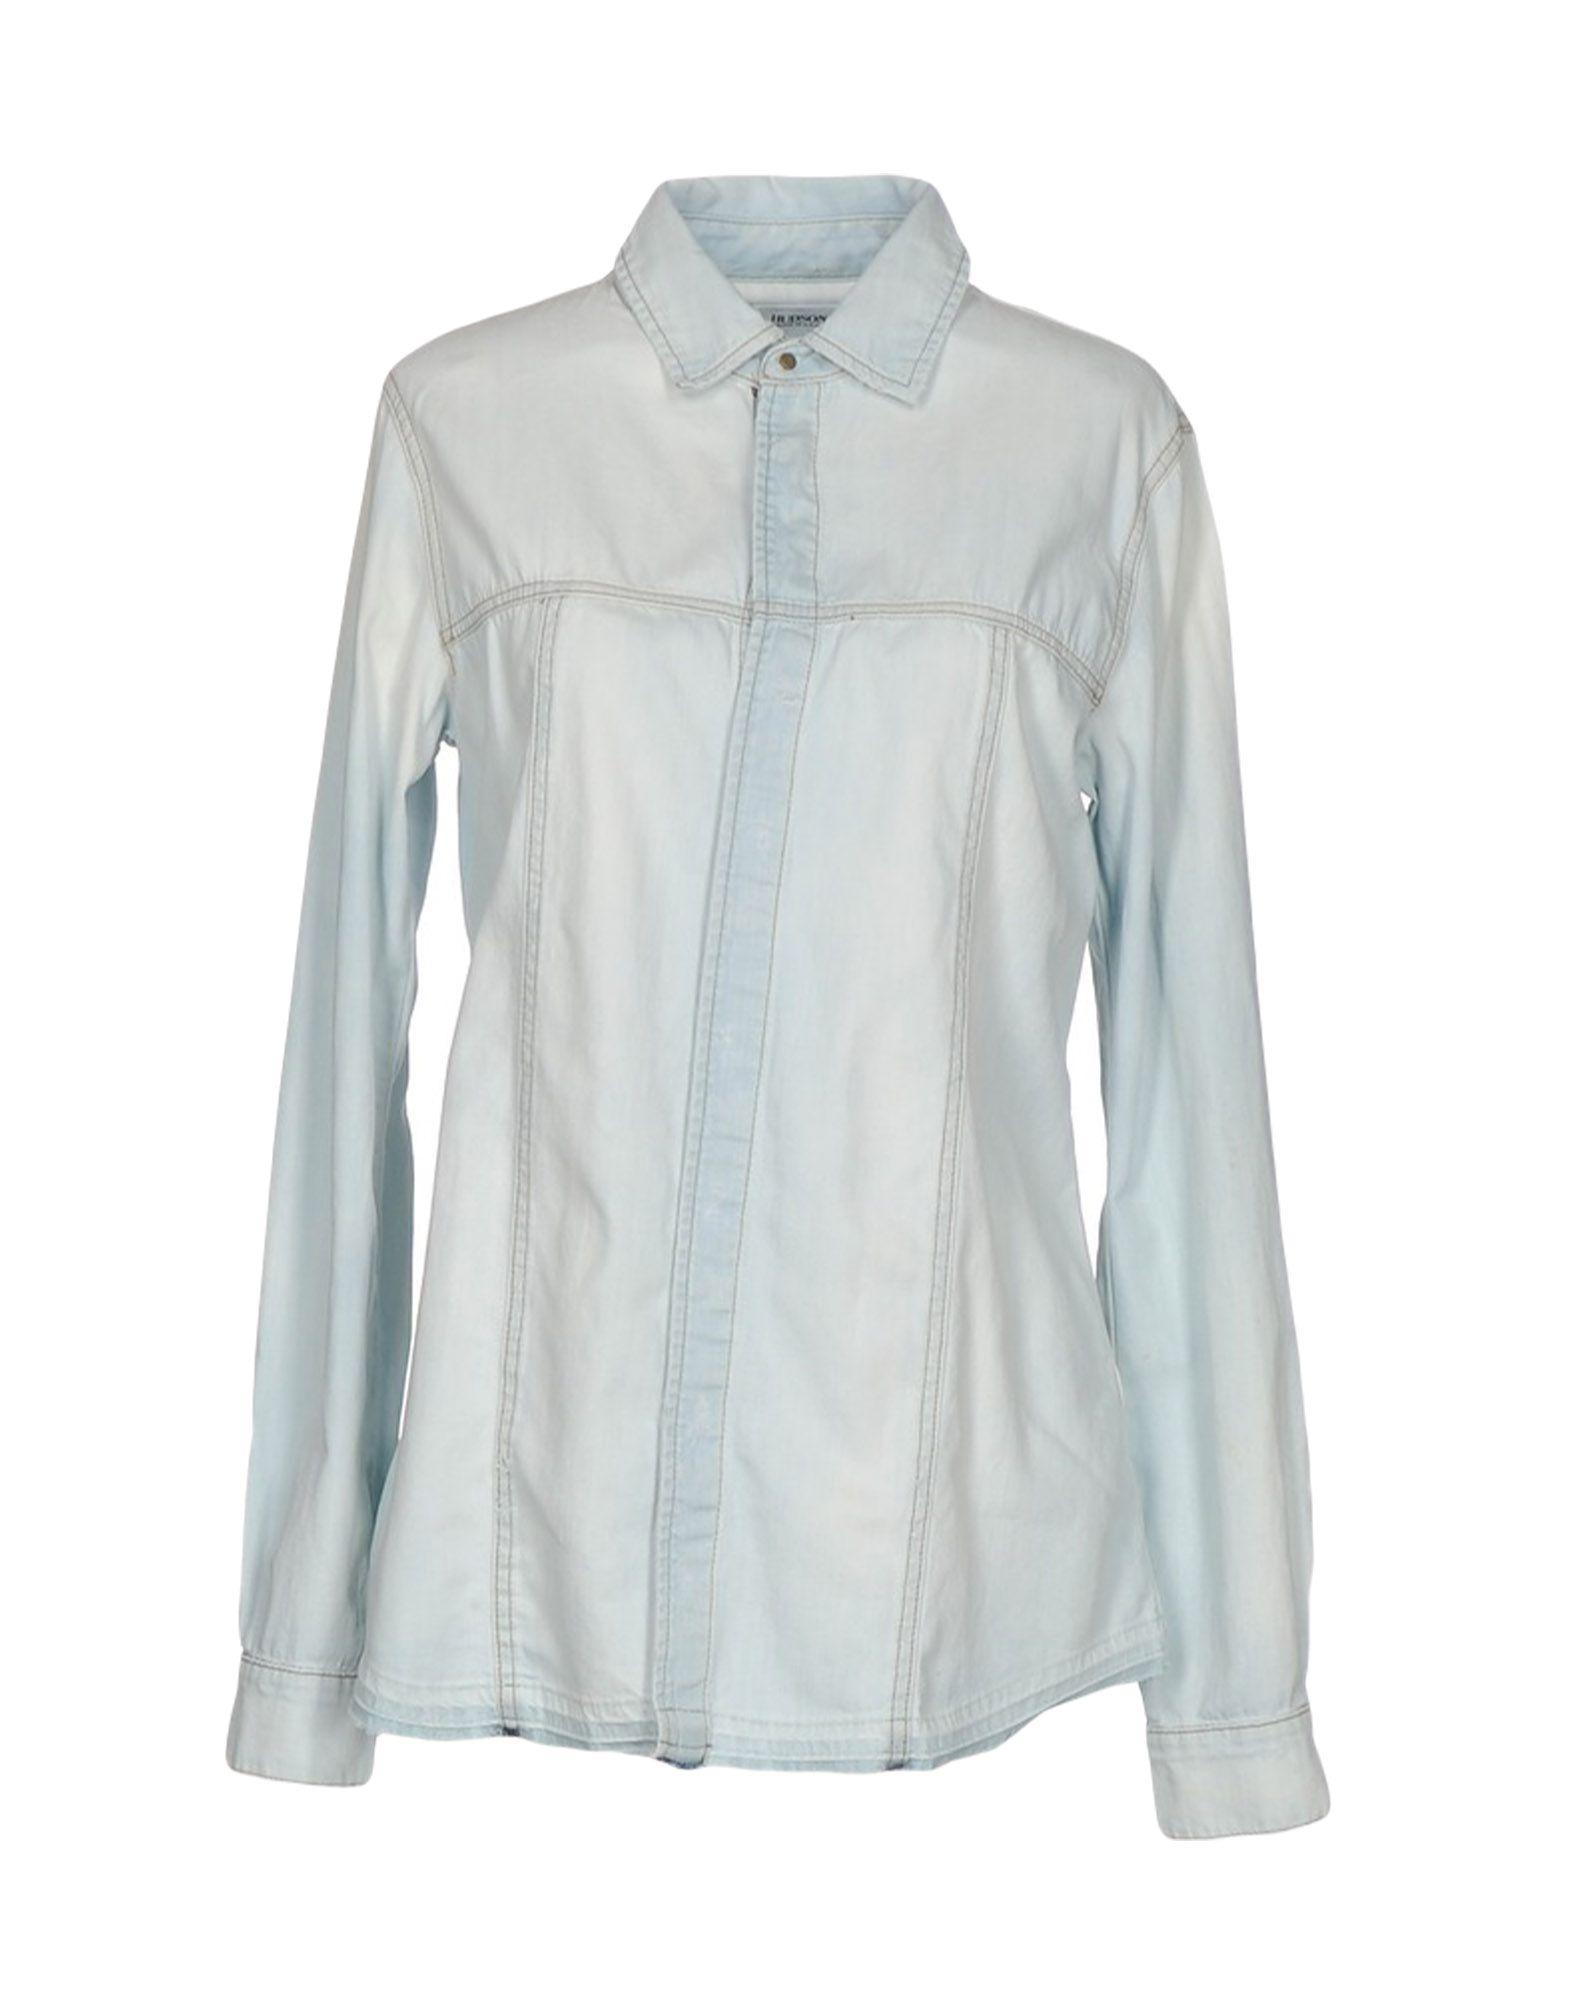 HUDSON Джинсовая рубашка блуза нижняя майка